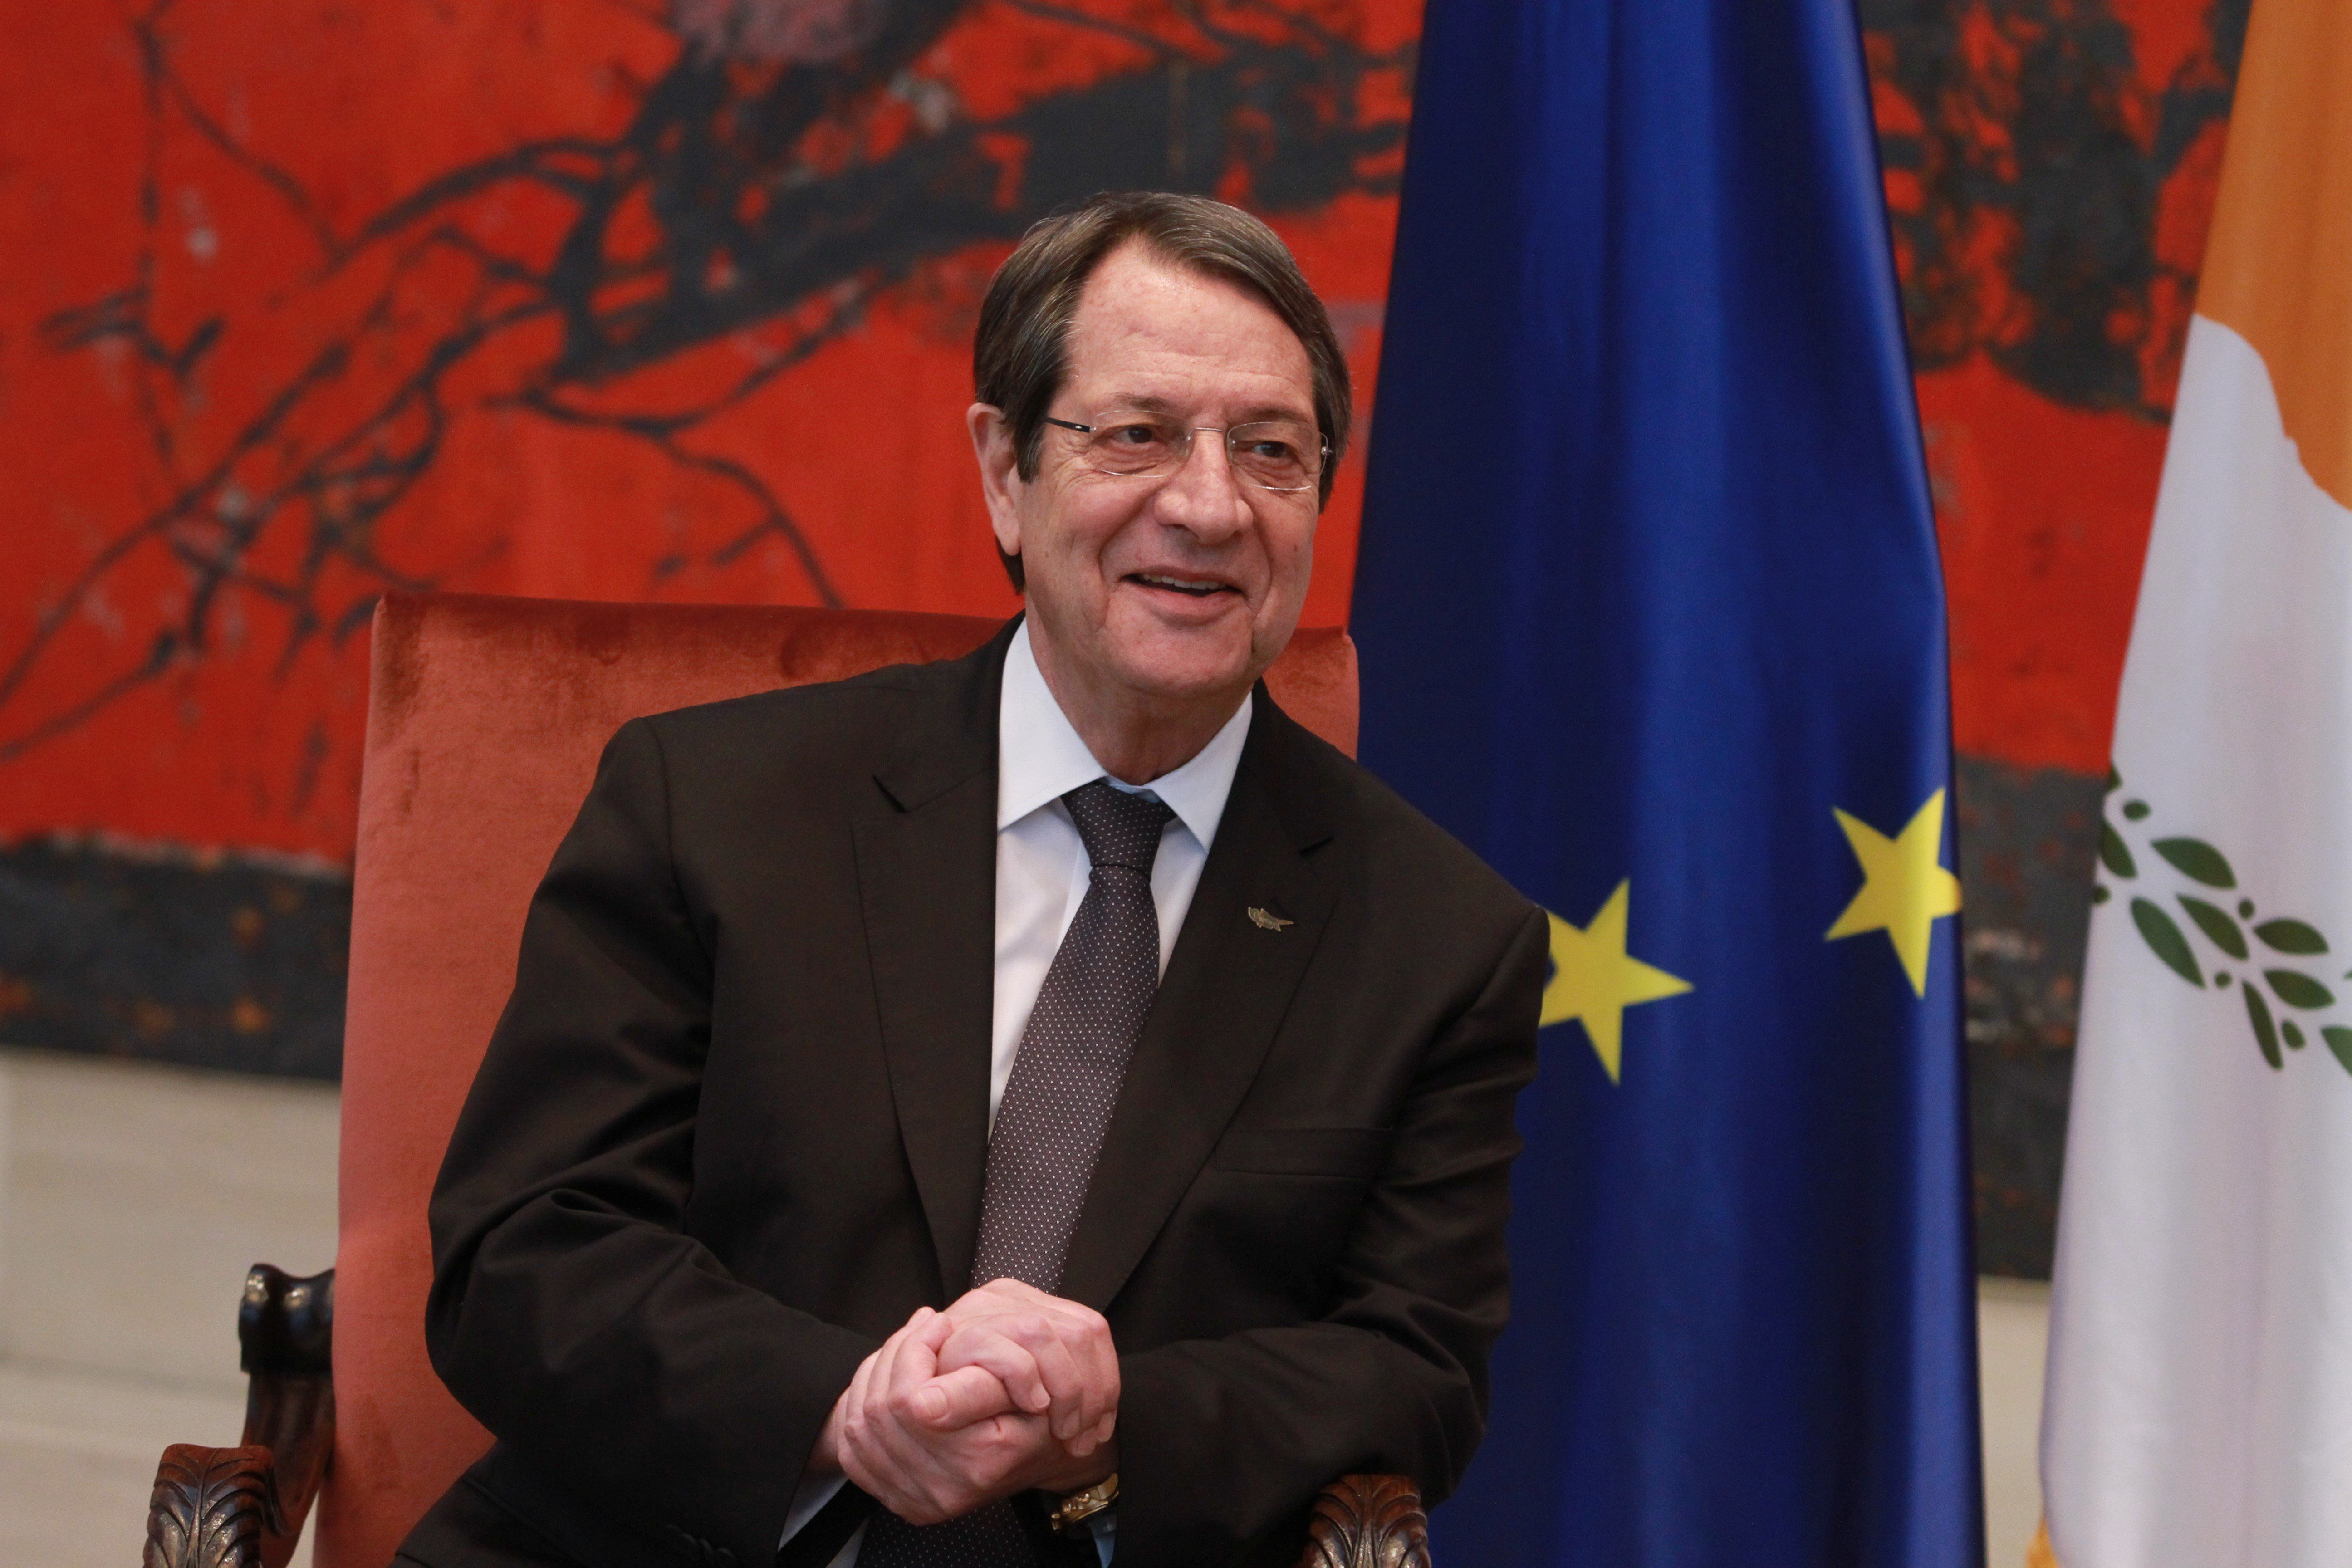 O Αναστασιάδής επιθυμεί νέο γύρο διαλόγου για το Κυπριακό αρκεί να γίνονται σεβαστές οι παράμετροι που θέτει ο